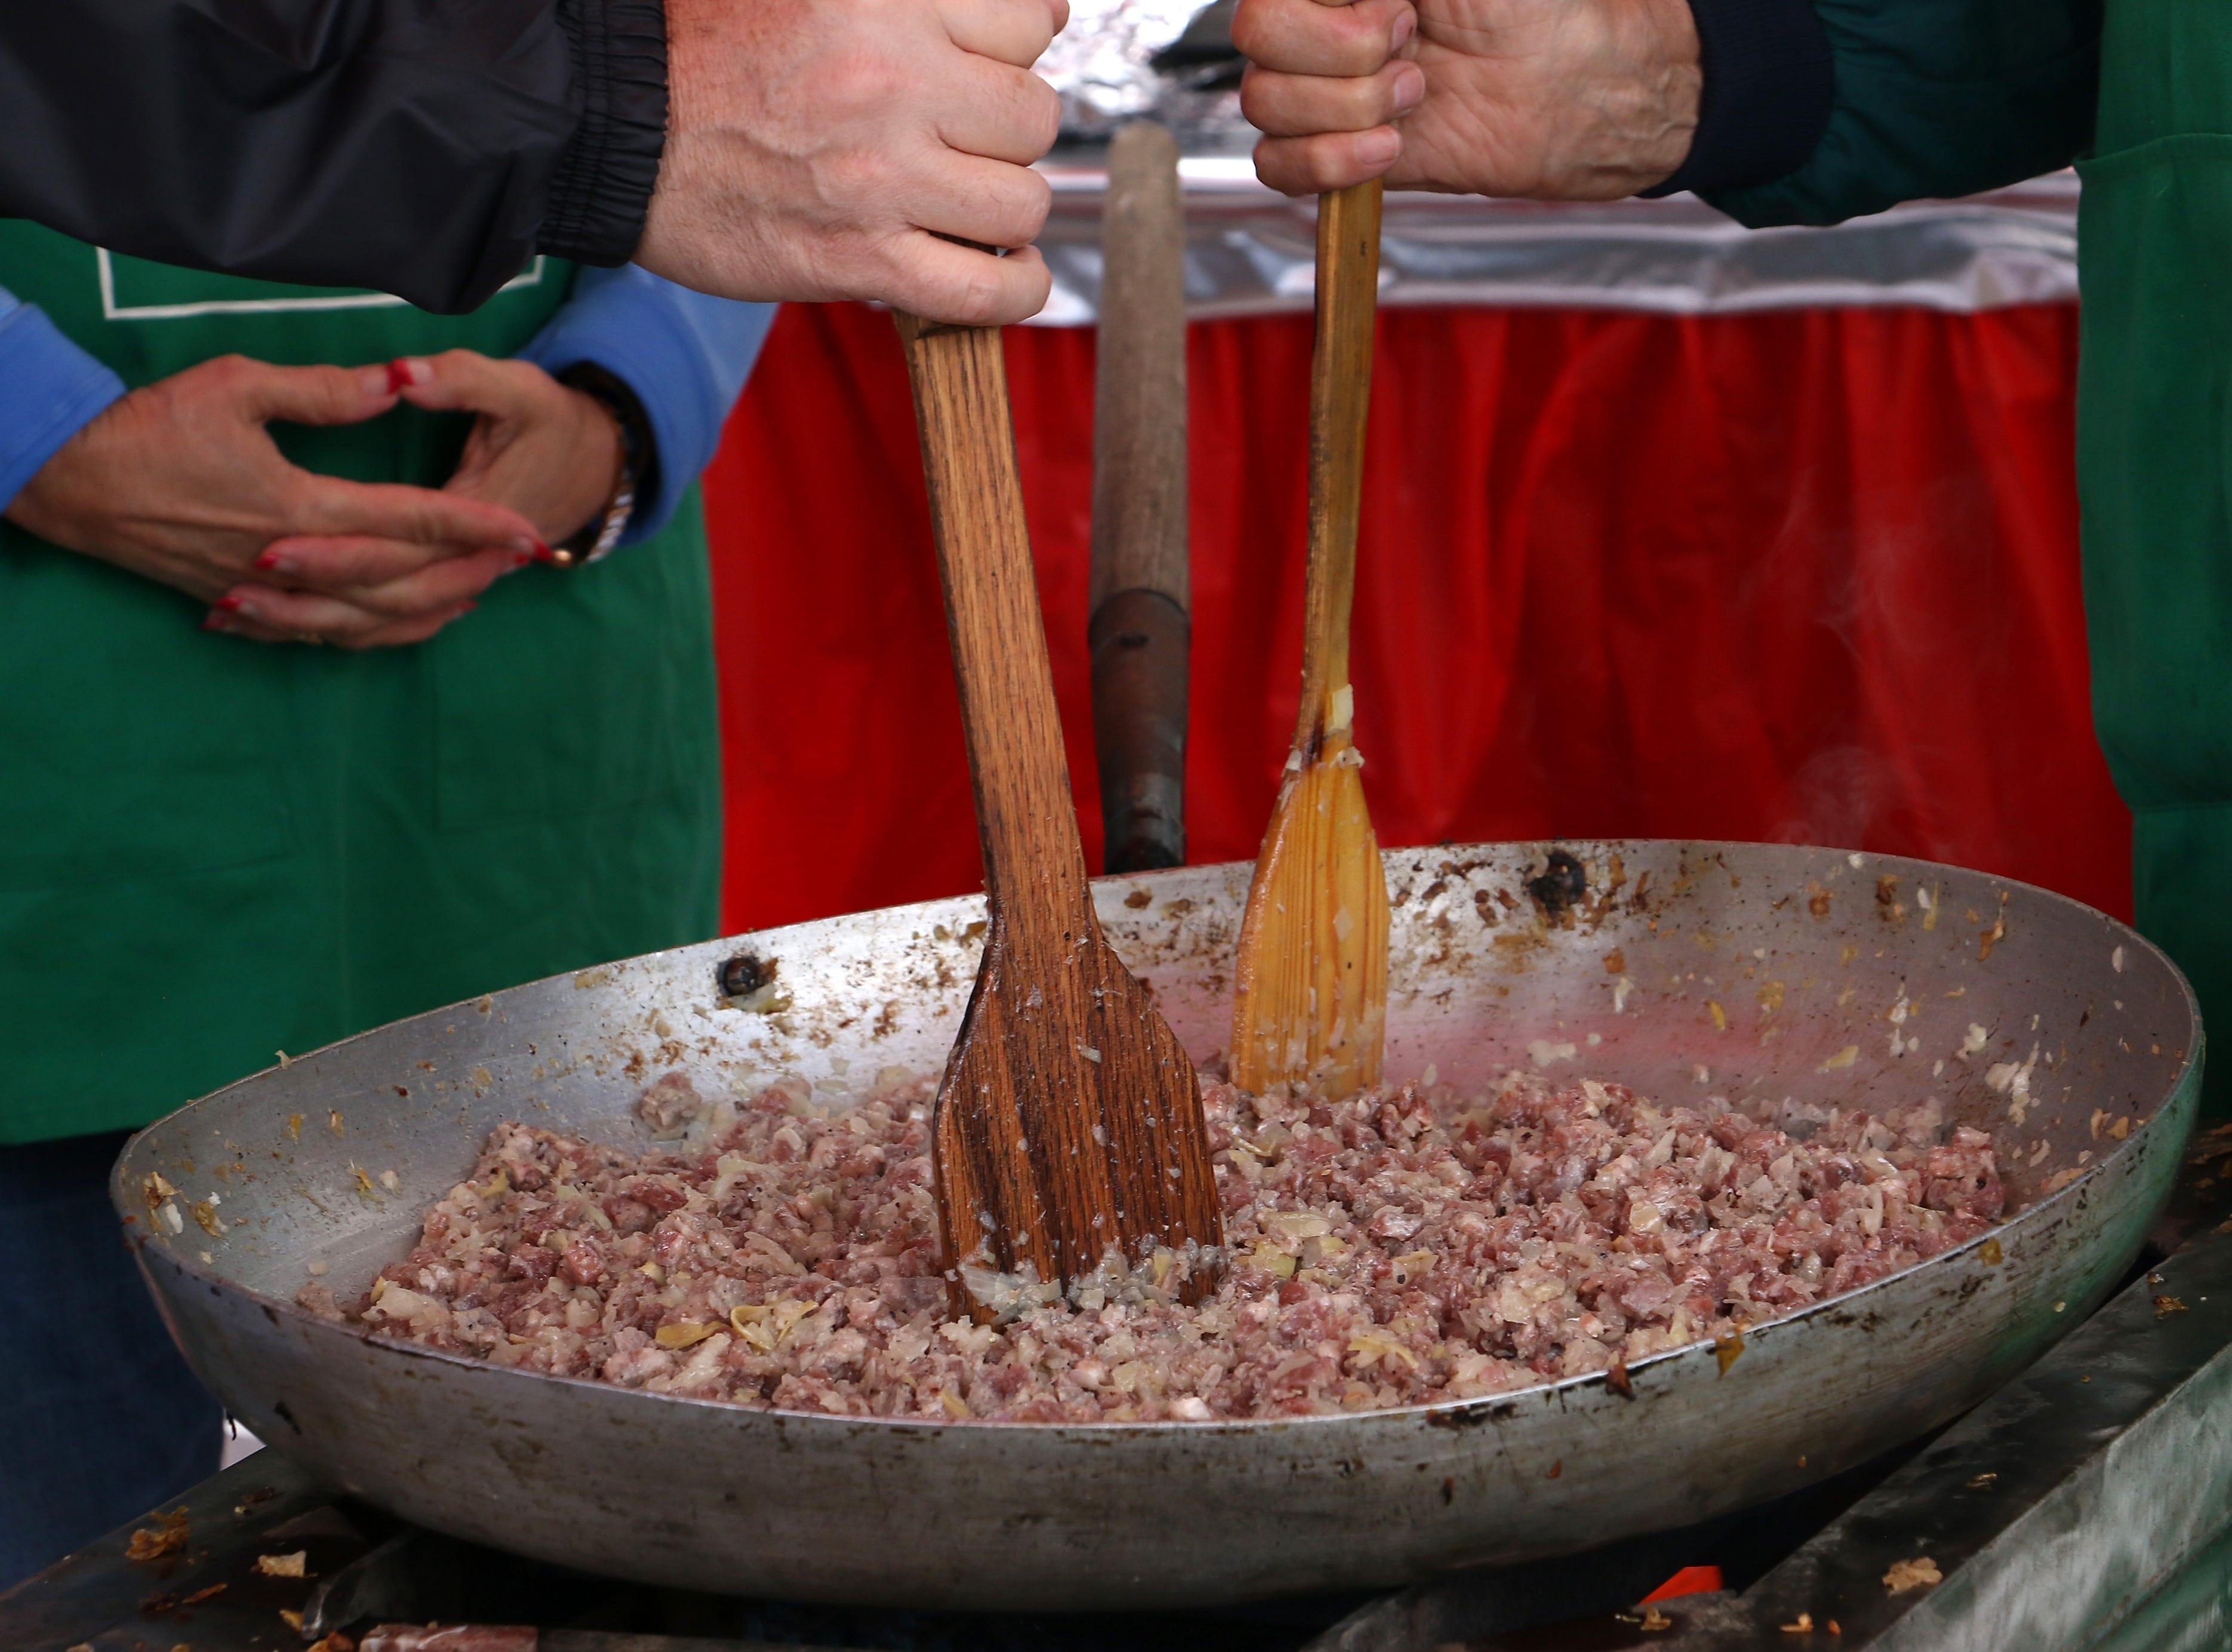 Chefs prepare an artichoke dish during the Eldorado Great Italian Festival in downtown Reno on Oct. 6, 2018.